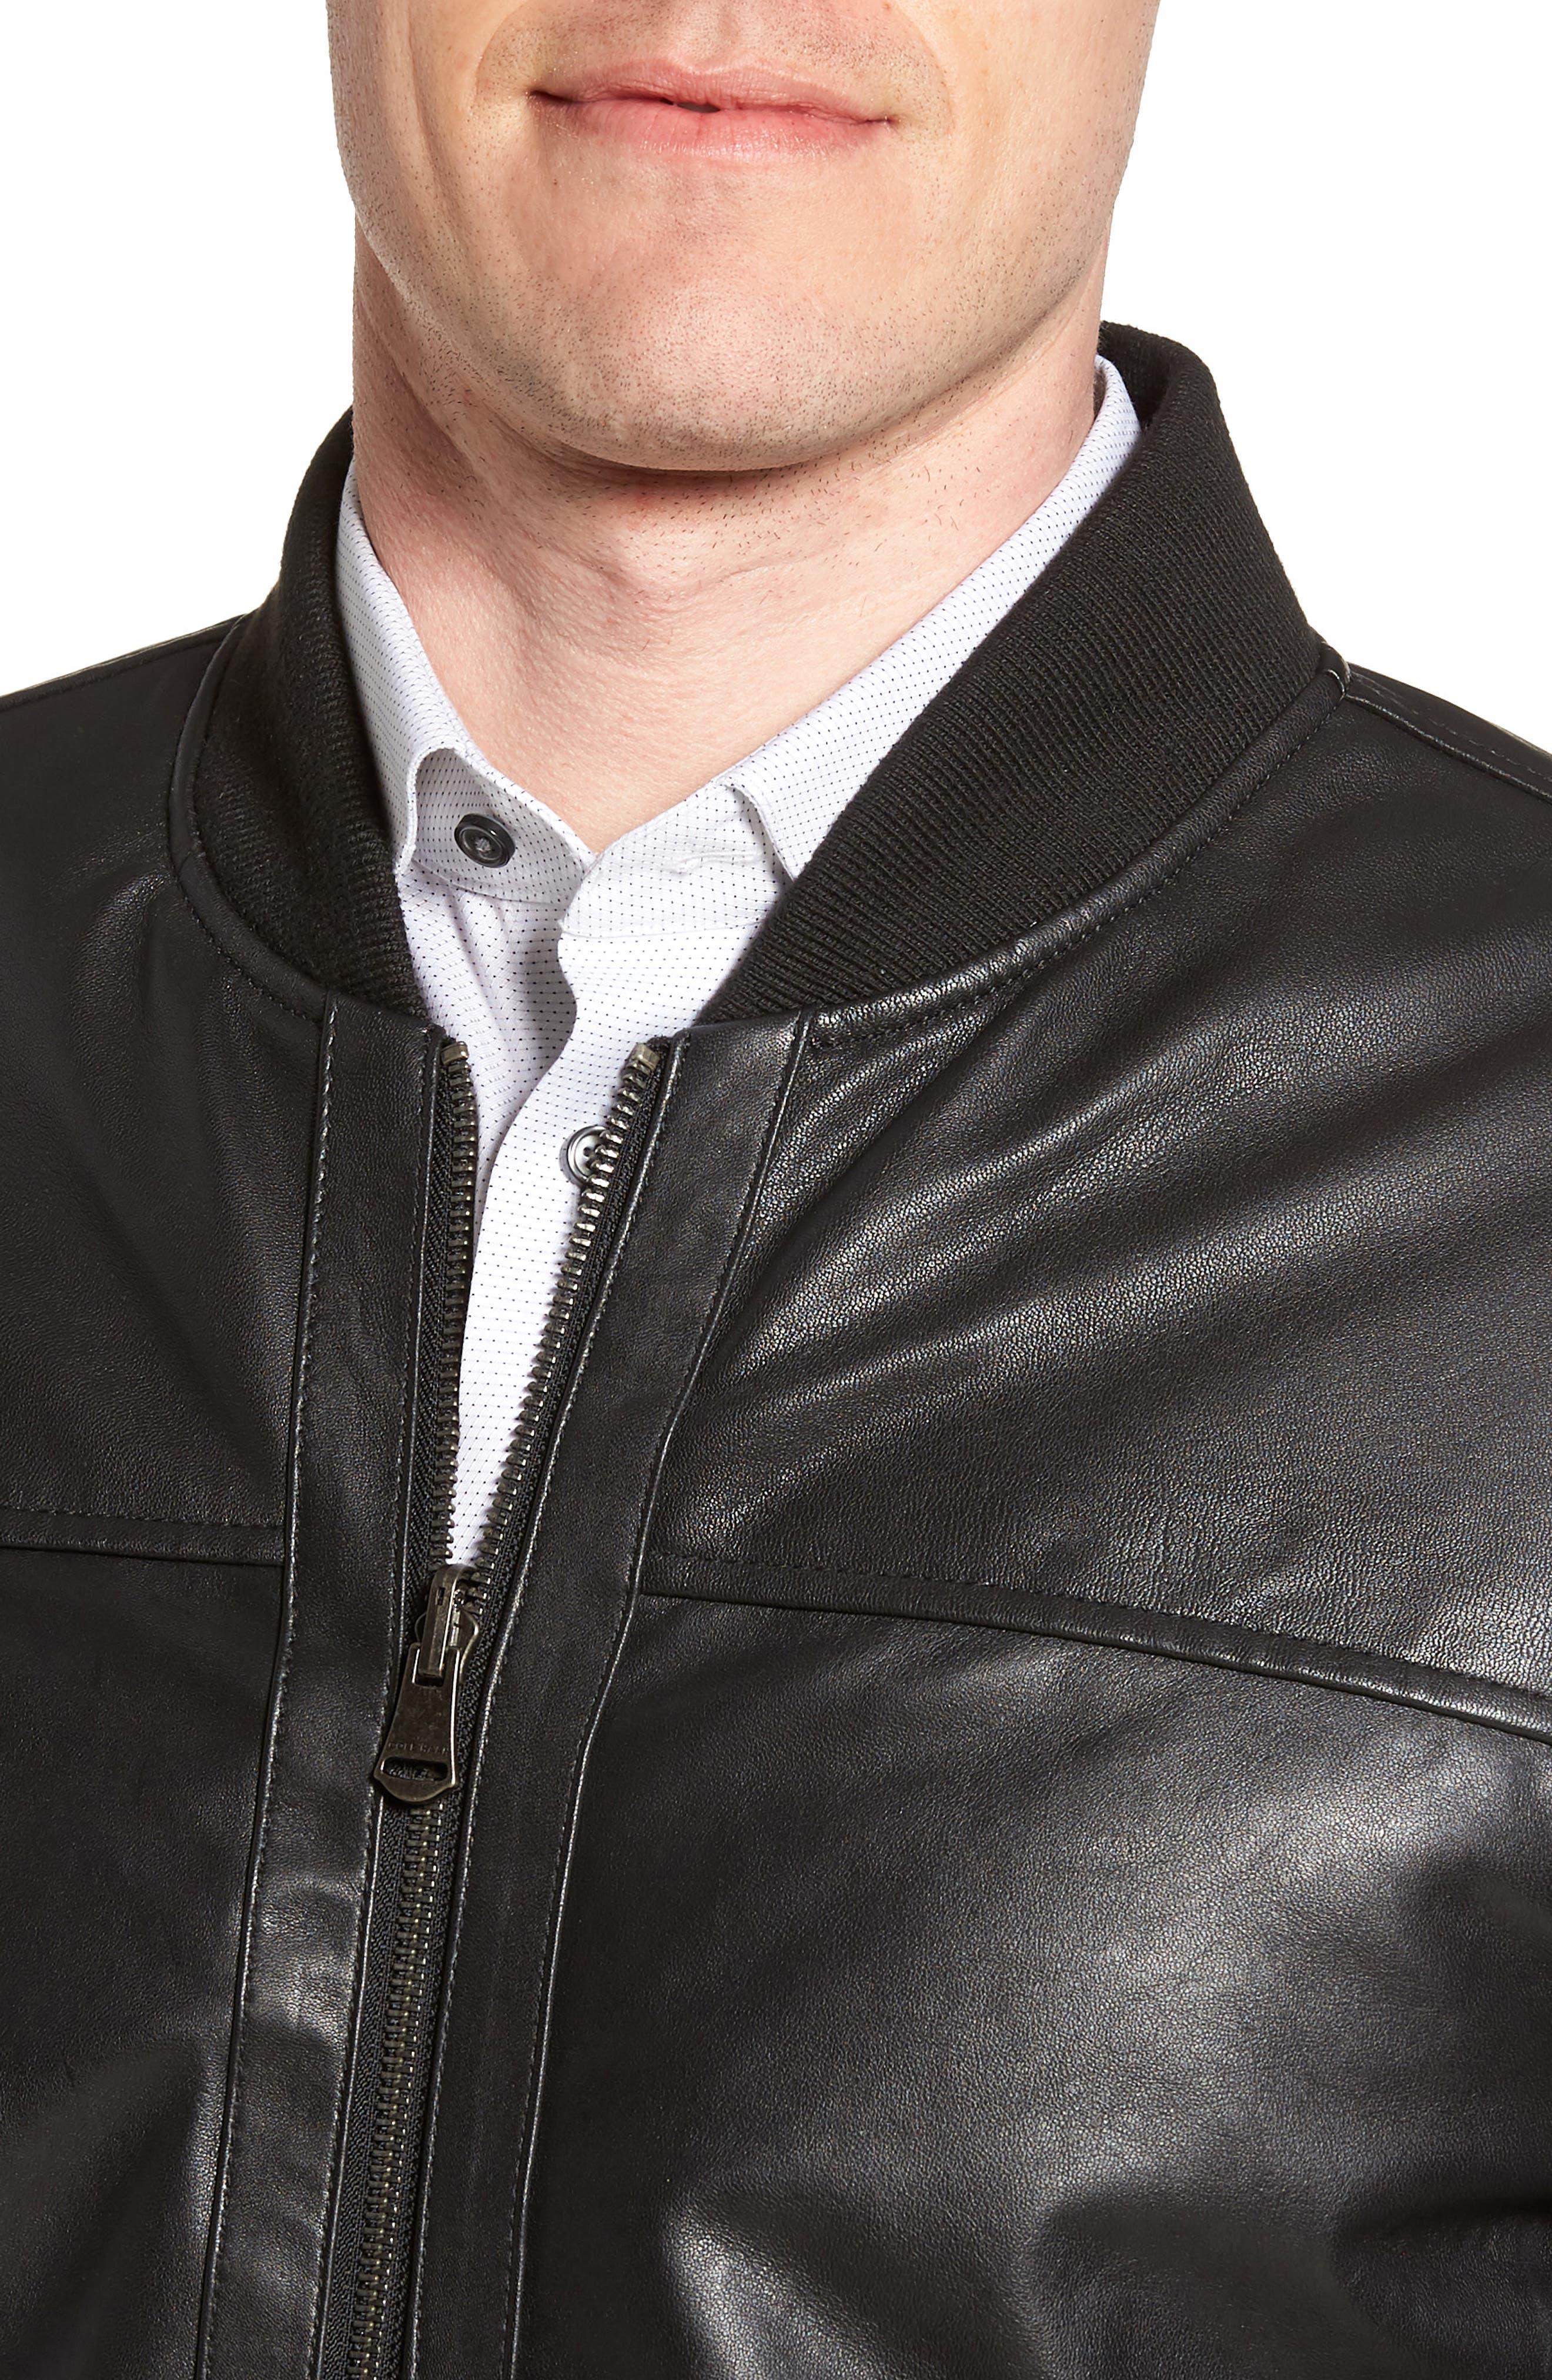 Reversible Leather Jacket,                             Alternate thumbnail 5, color,                             Black/ Navy